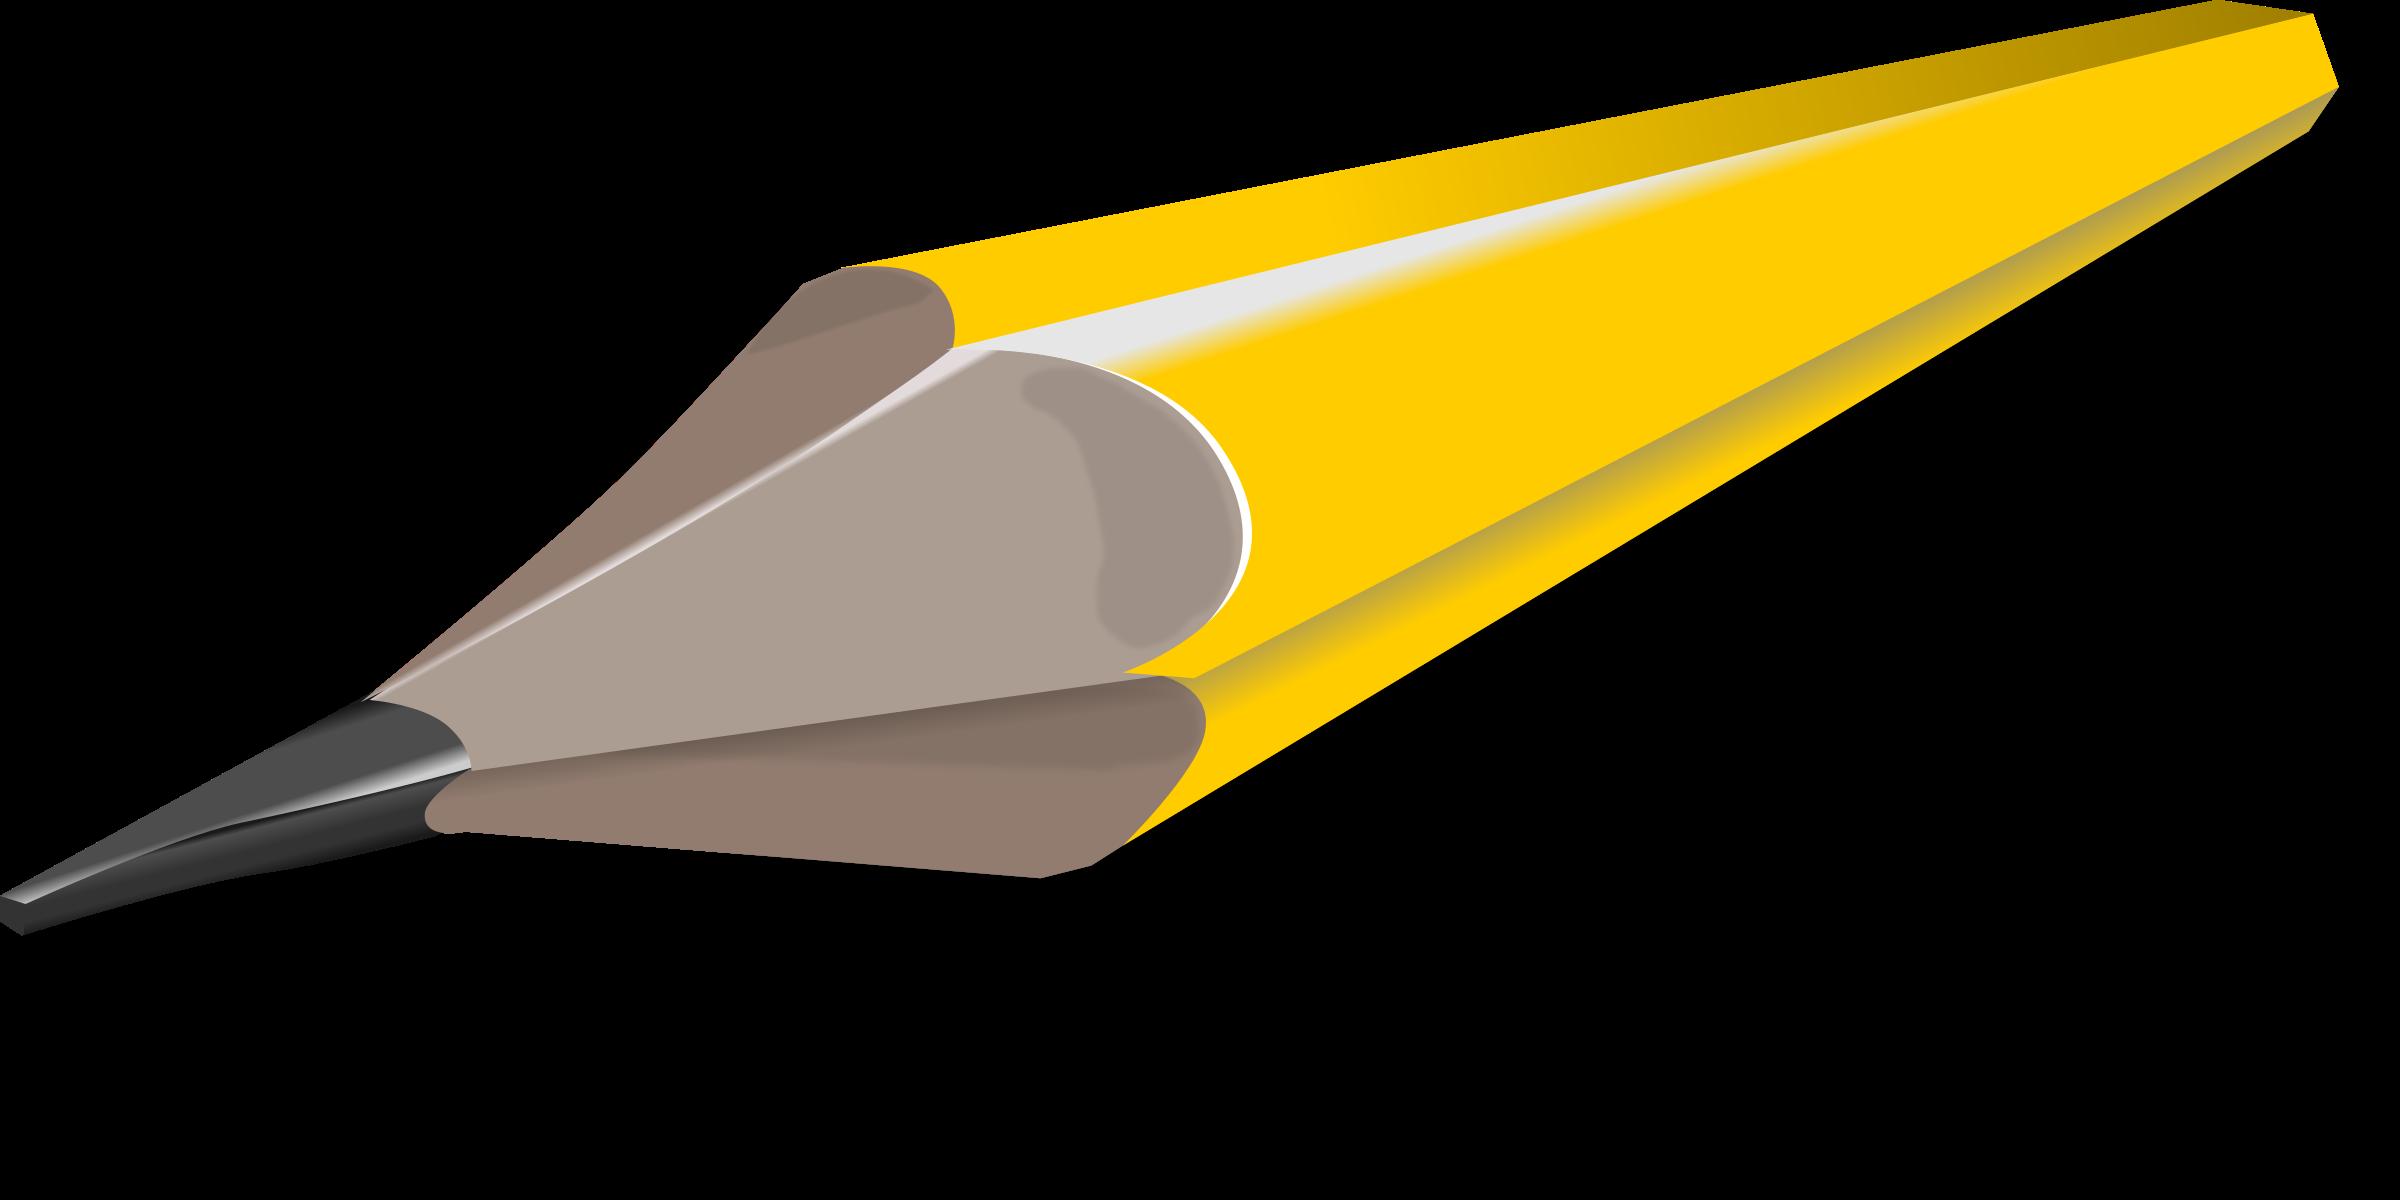 Pencil big image png. Clipart writing crayon